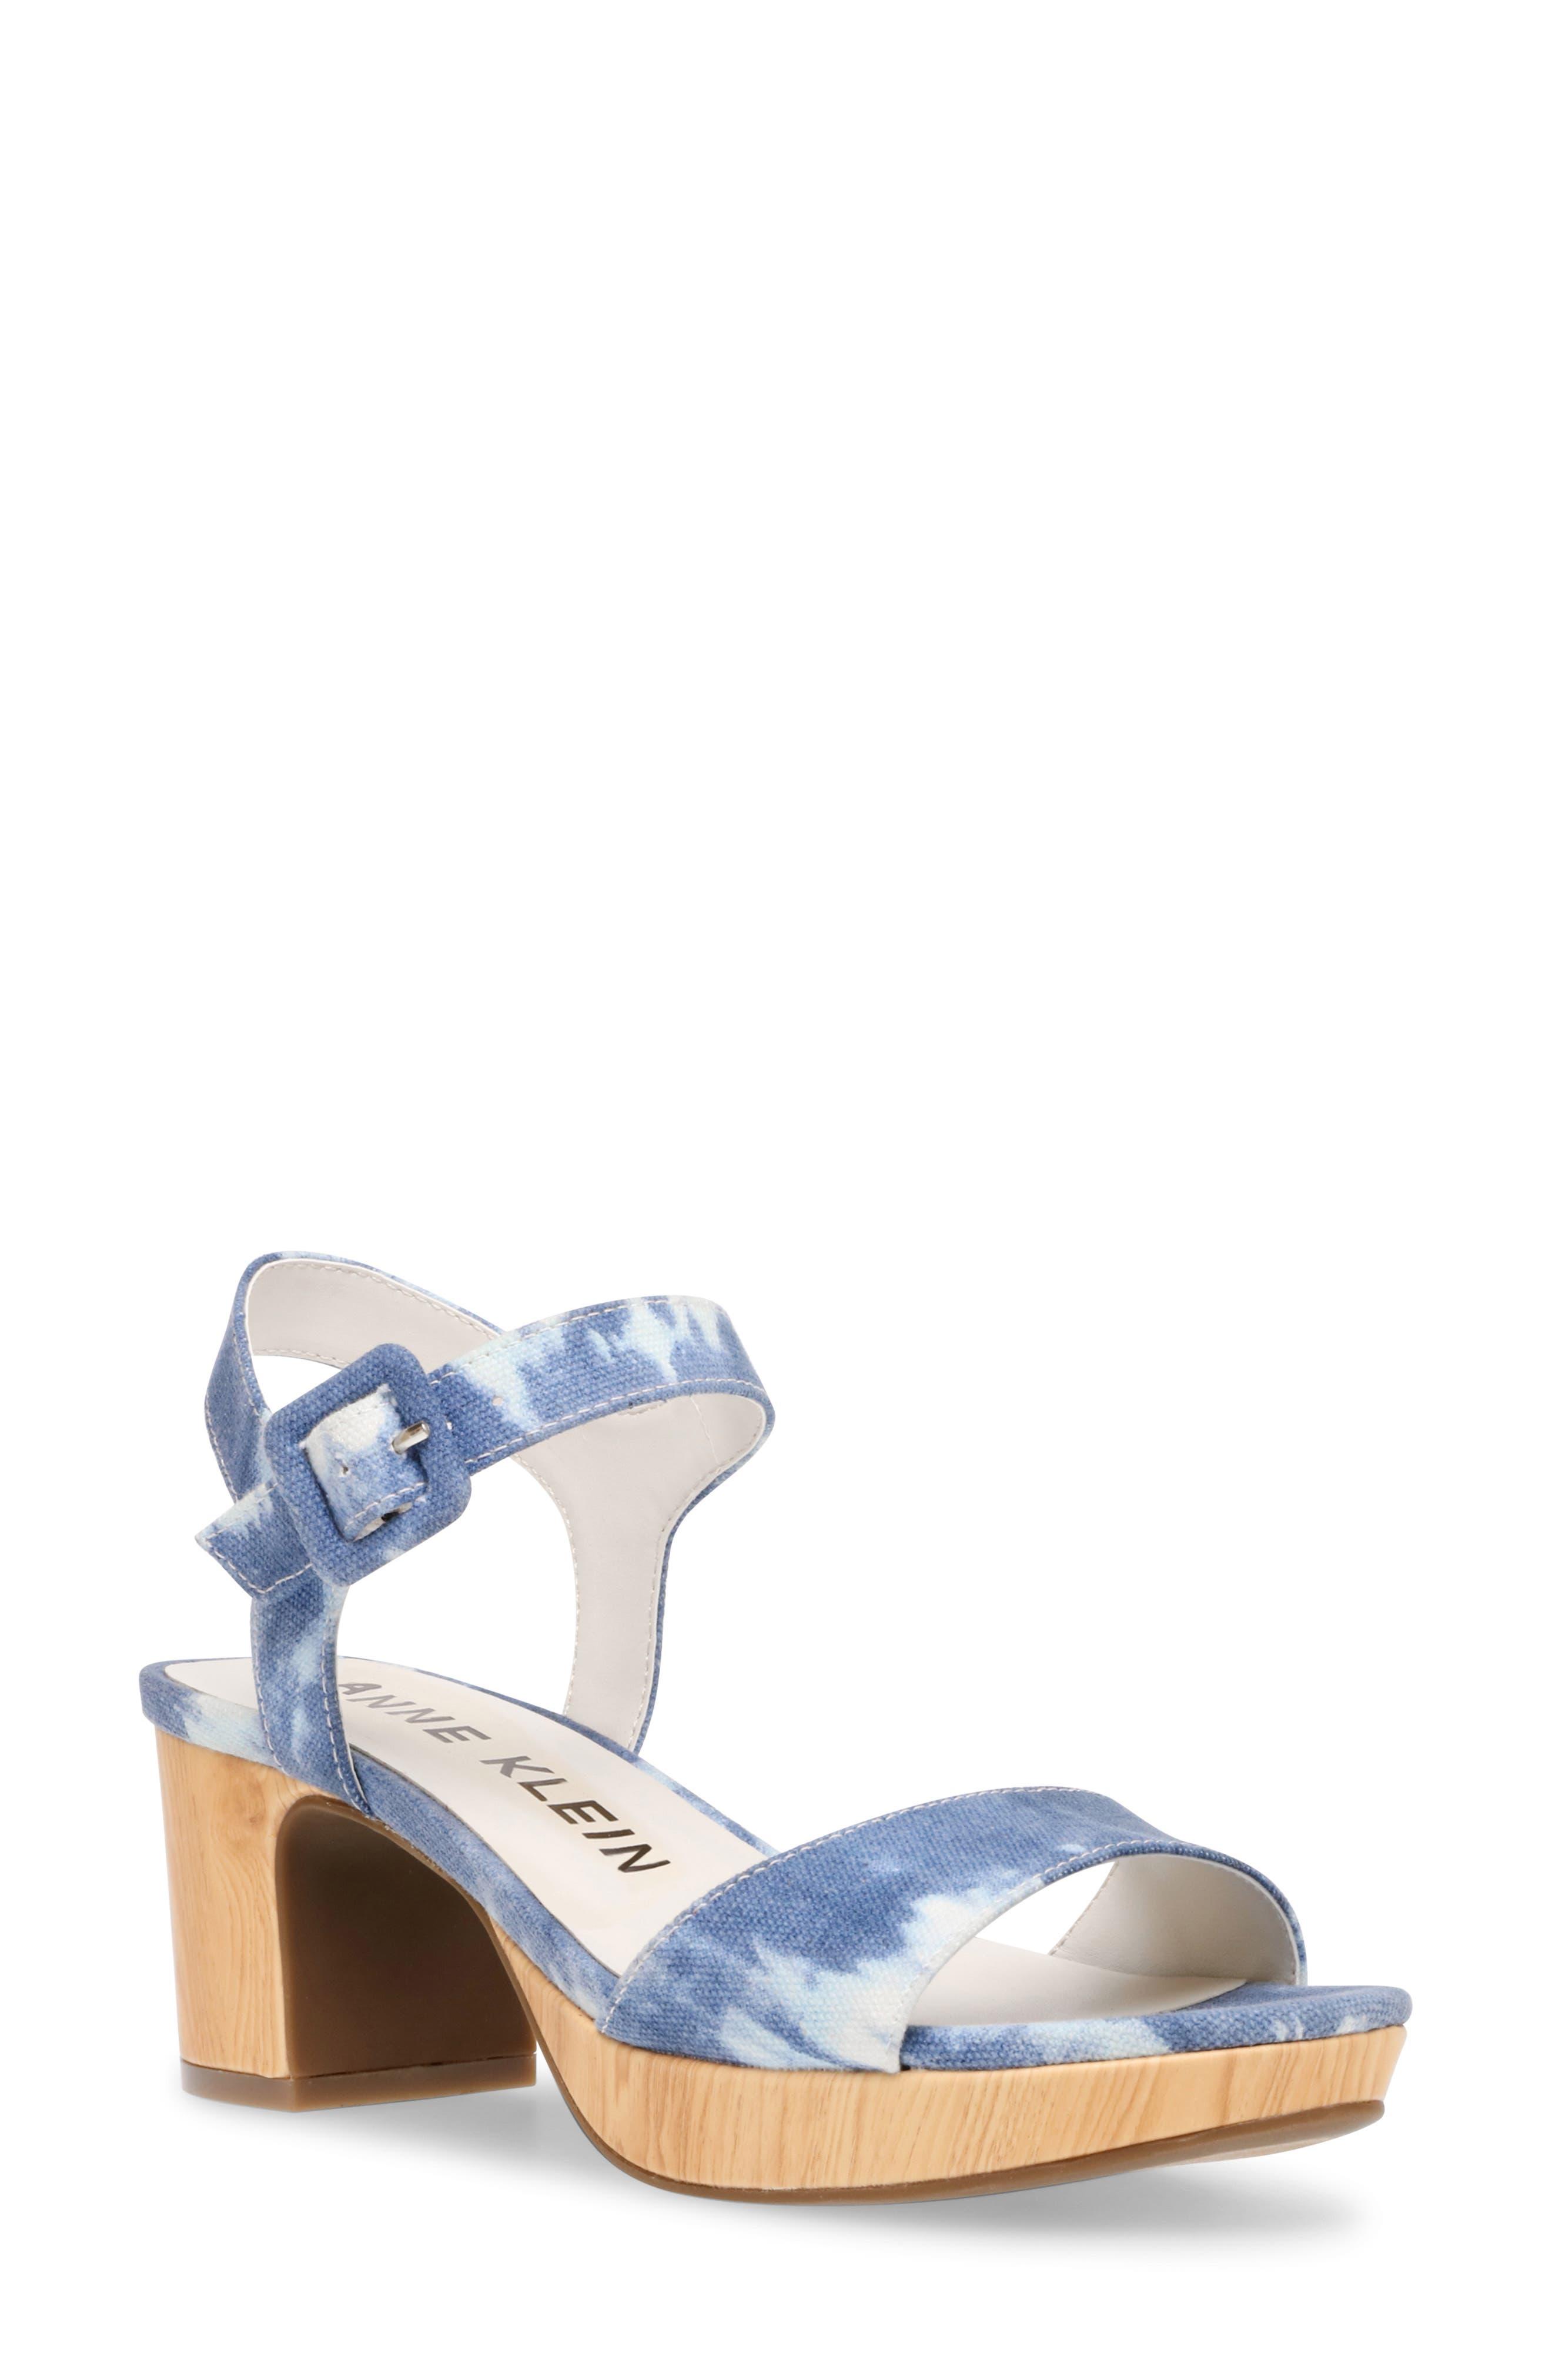 Peony Ankle Strap Sandal